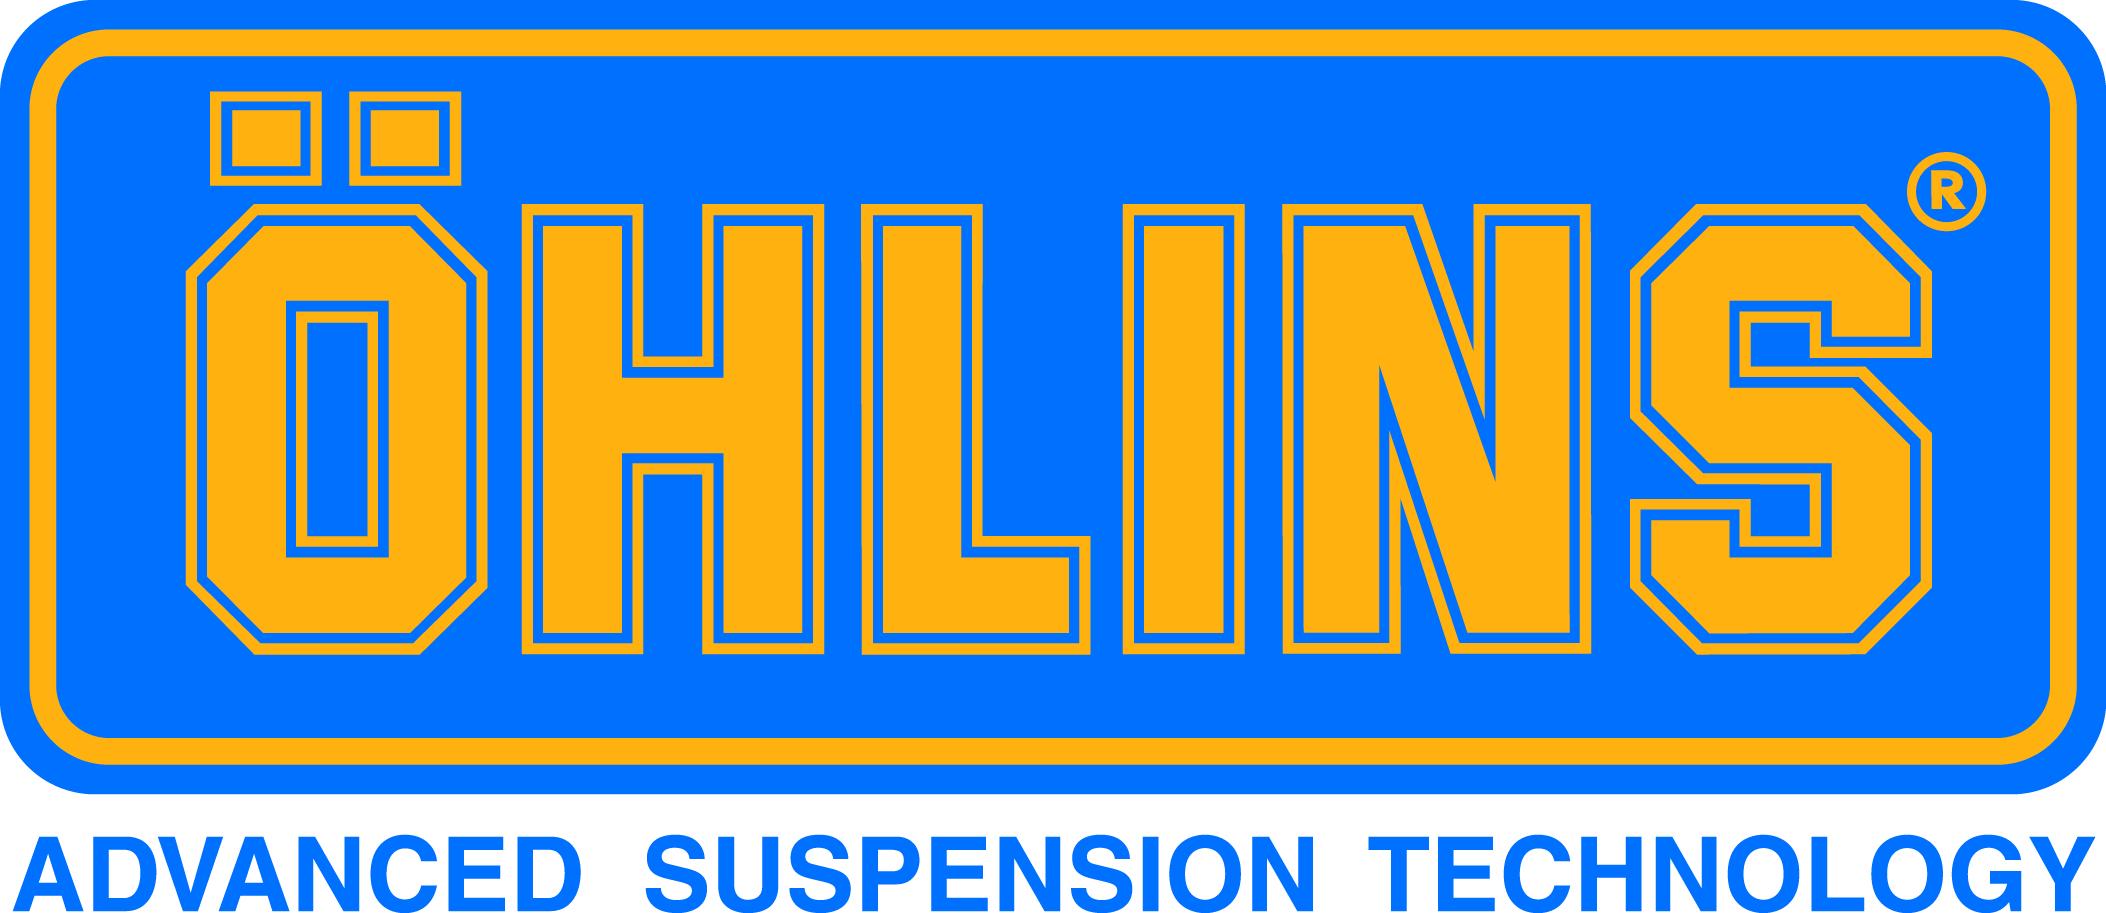 logo-hlins-racing.jpg